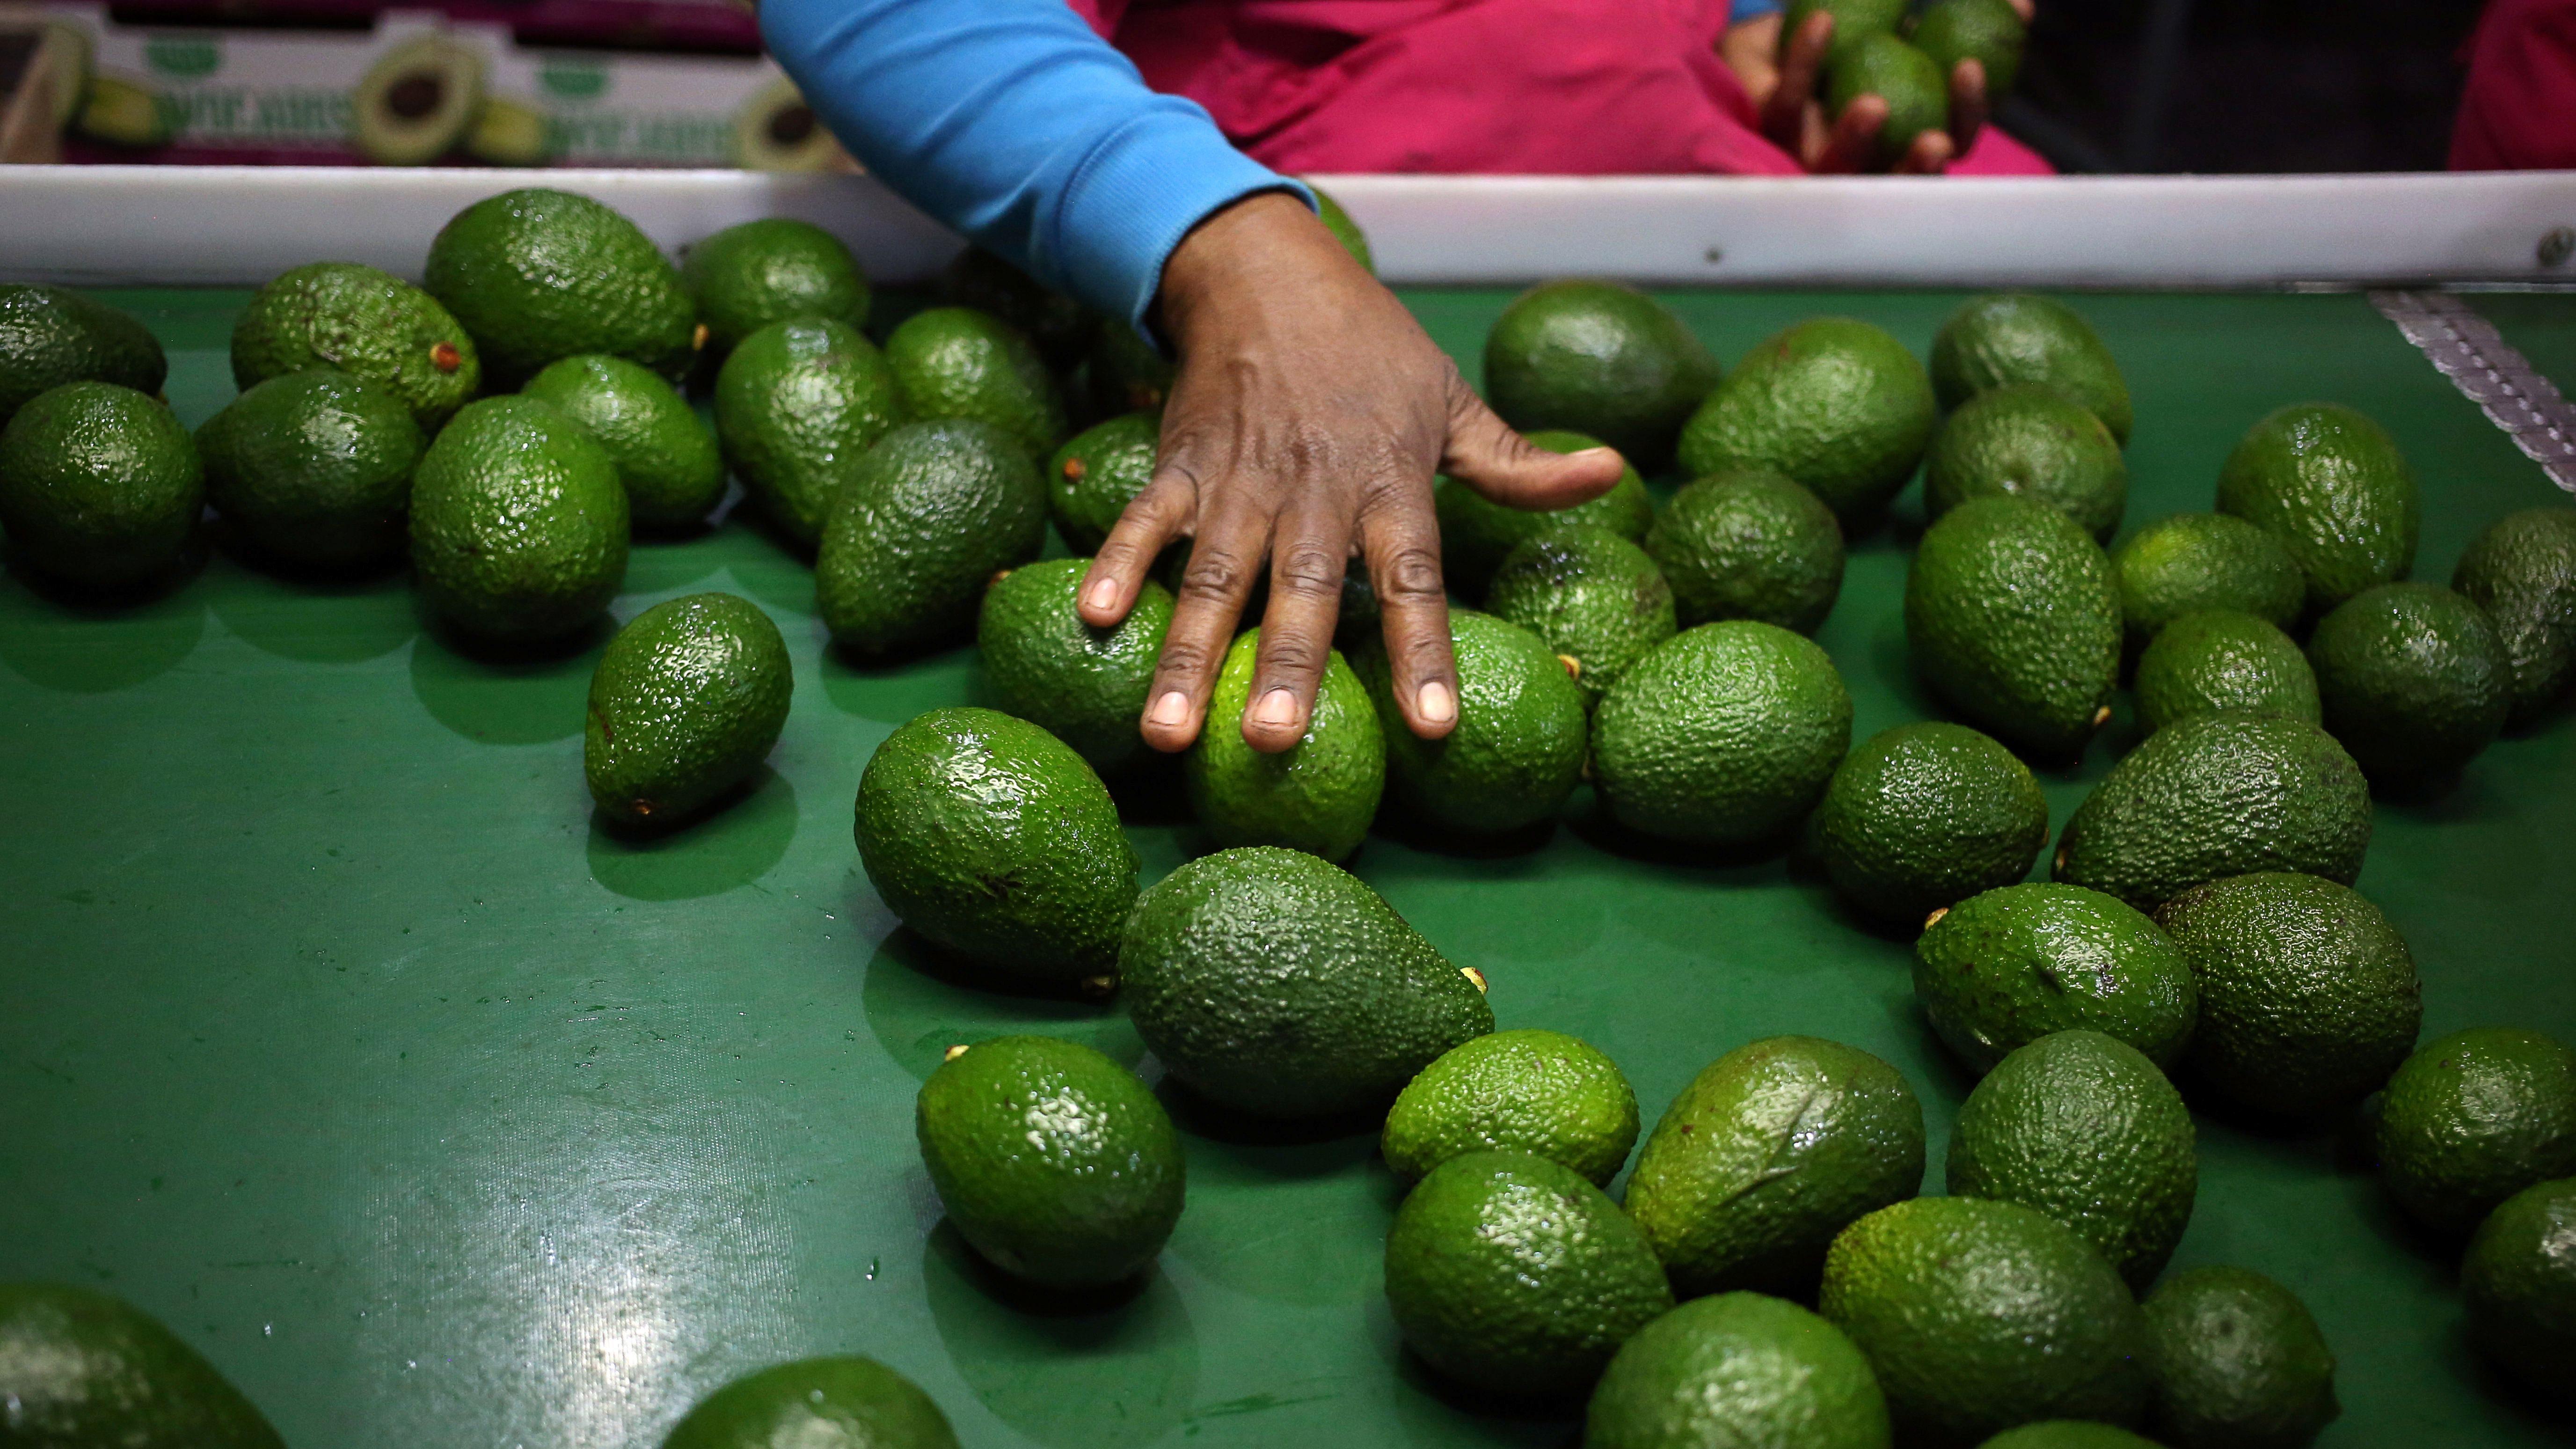 Mexico's avocado growers increasingly face cartel violence.